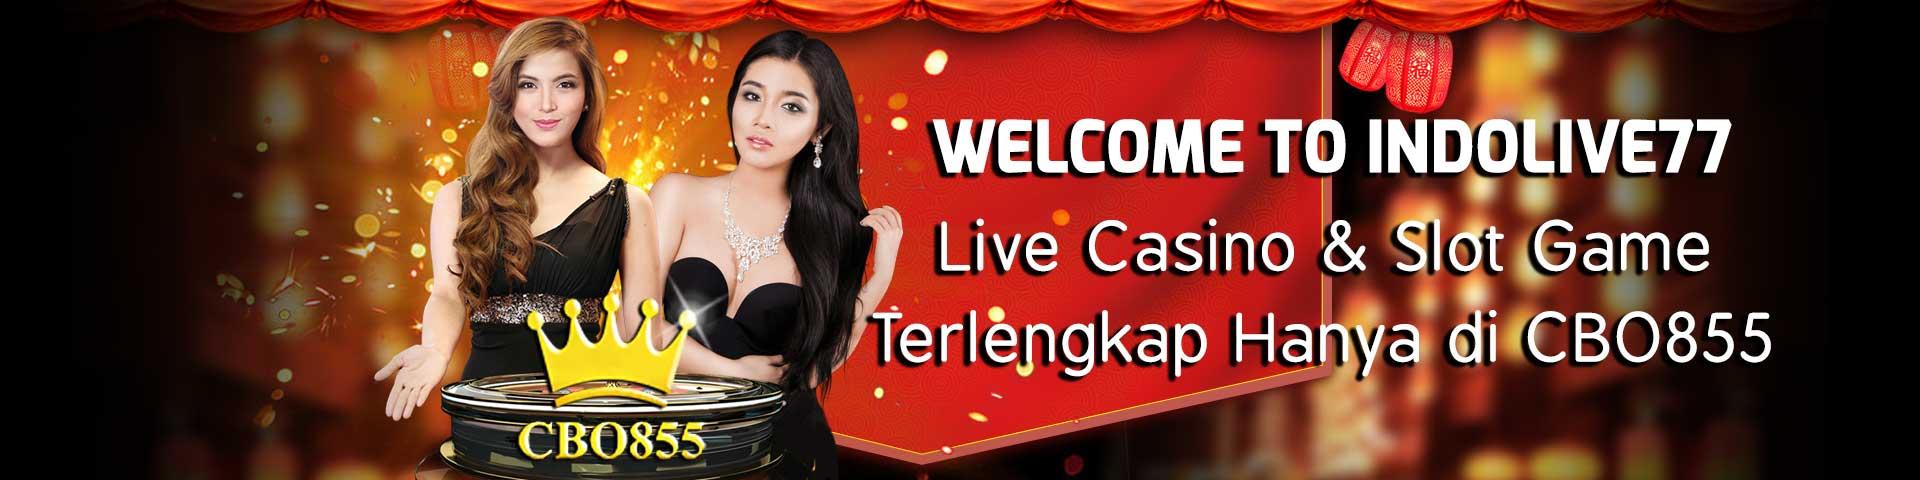 Daftar-Live-Casino-Game-Slot-Online-CBO855-Terpercaya